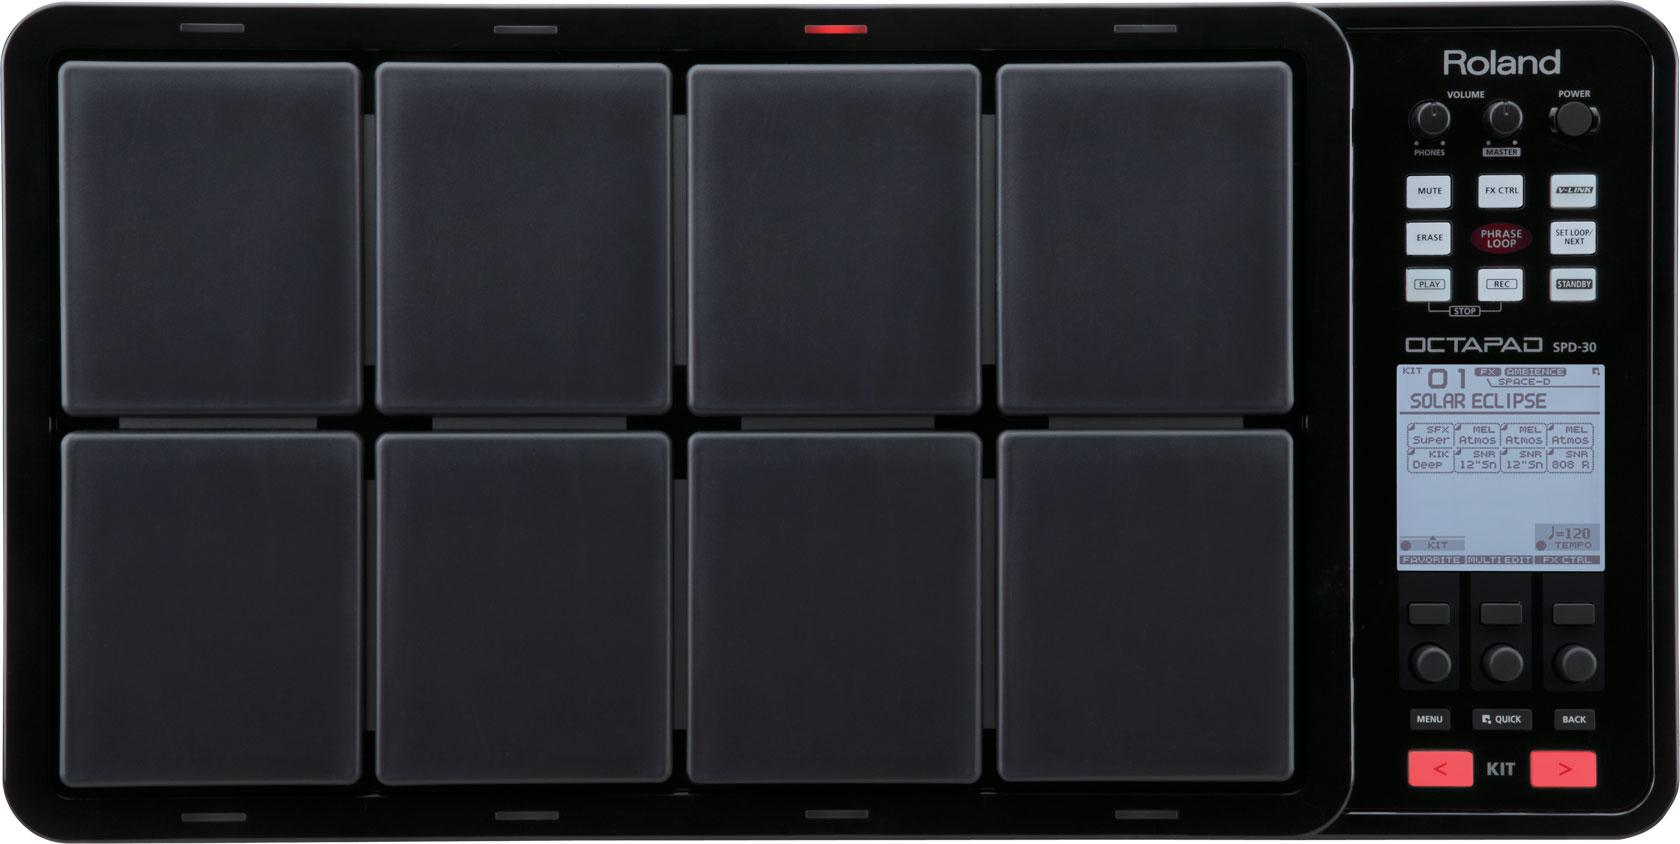 roland octapad spd 30 digital percussion pad. Black Bedroom Furniture Sets. Home Design Ideas